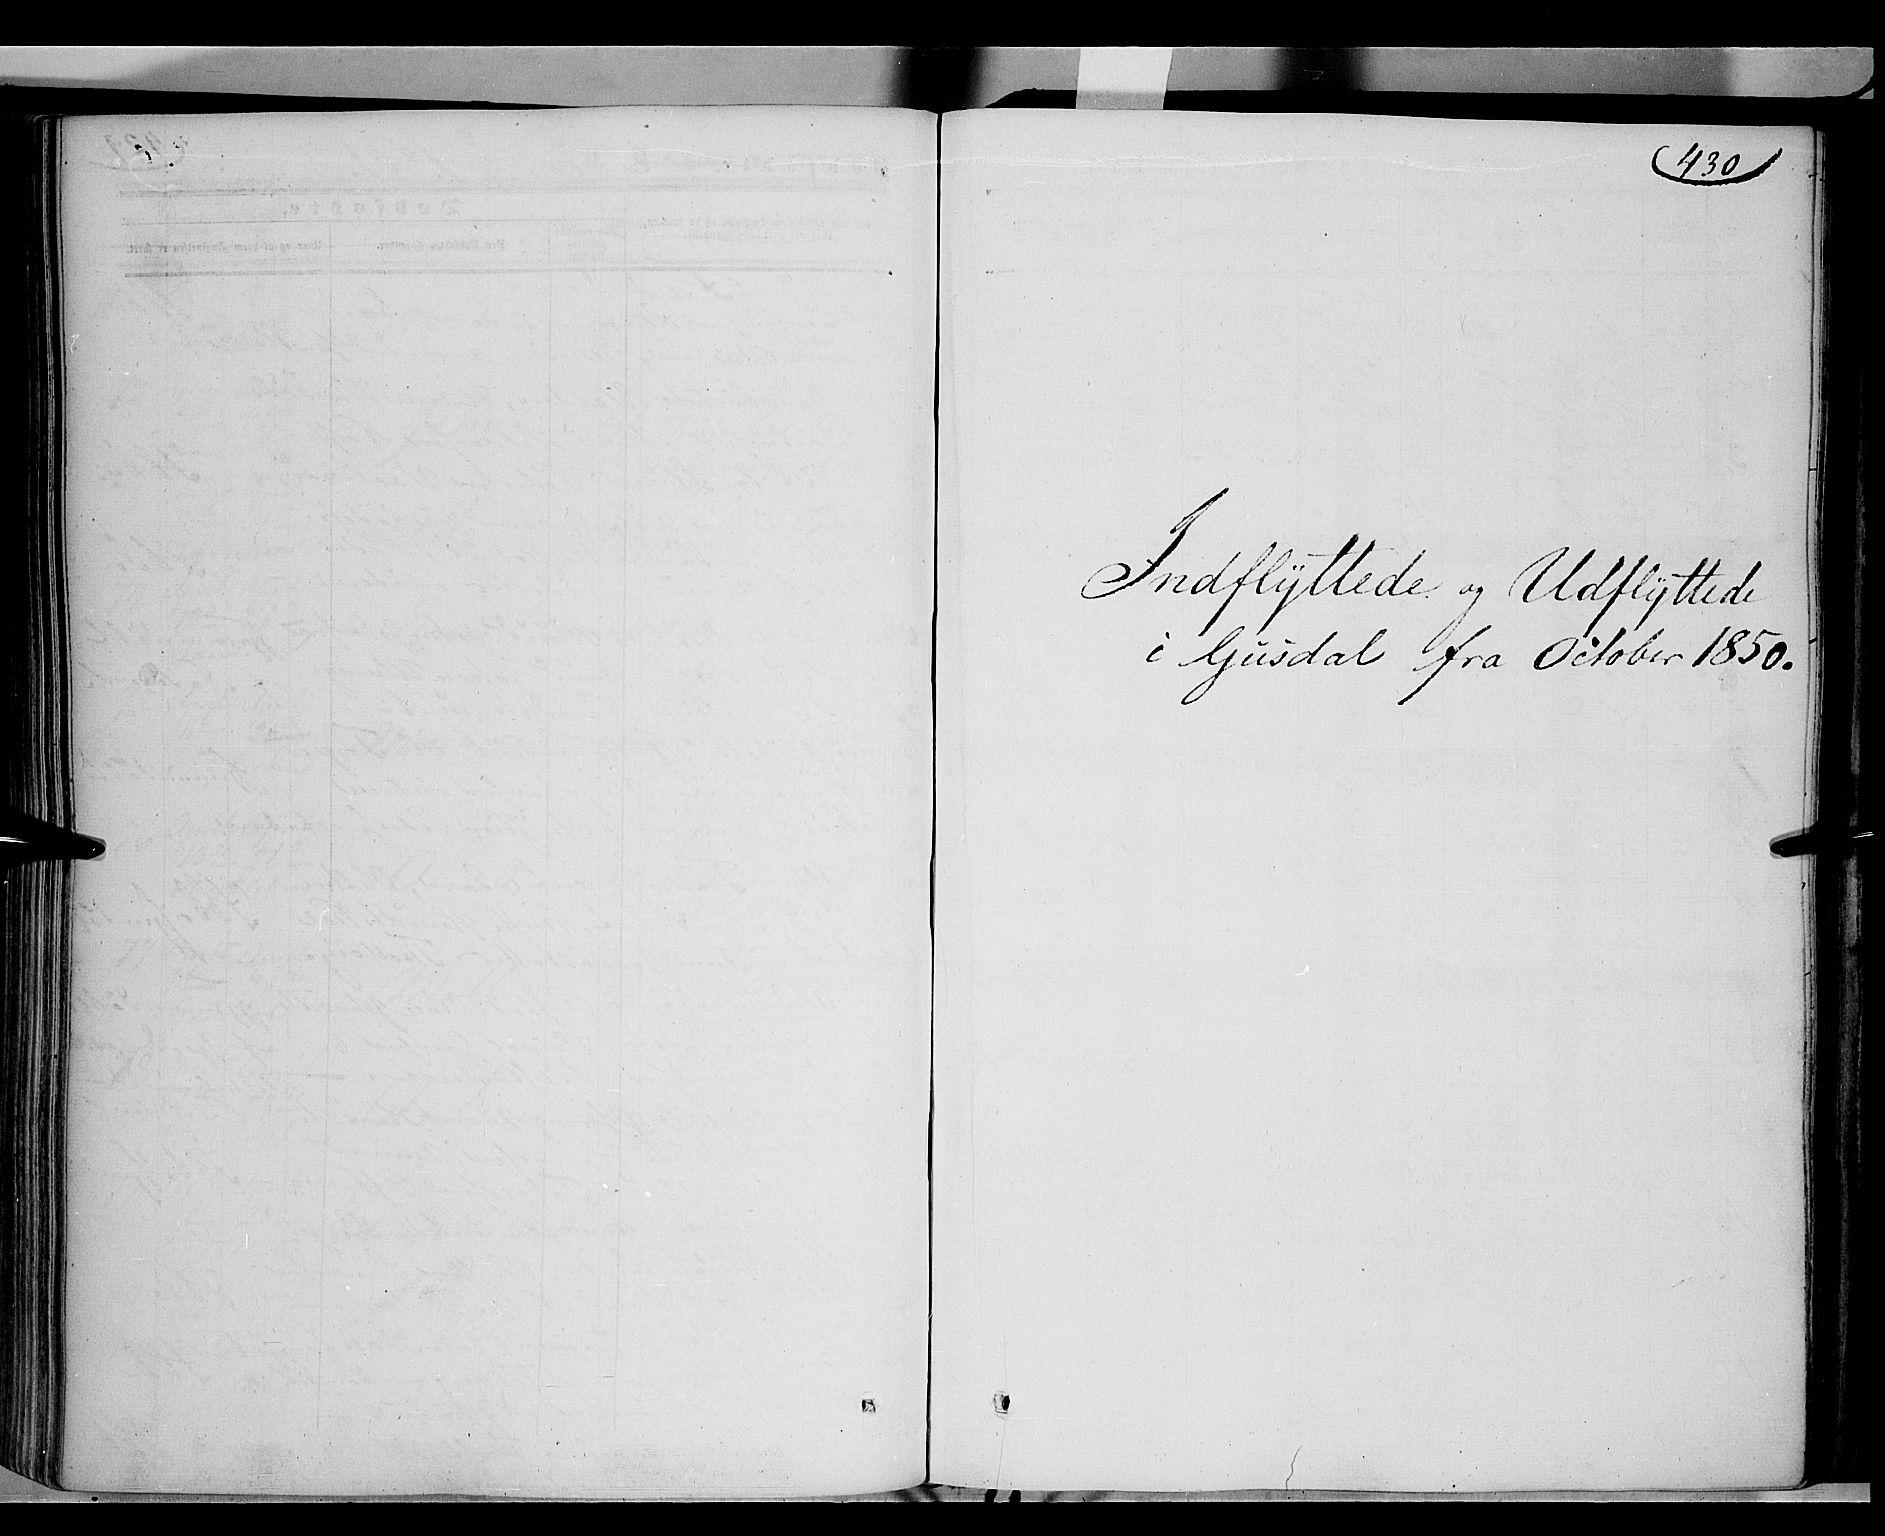 SAH, Gausdal prestekontor, Ministerialbok nr. 8, 1850-1861, s. 430